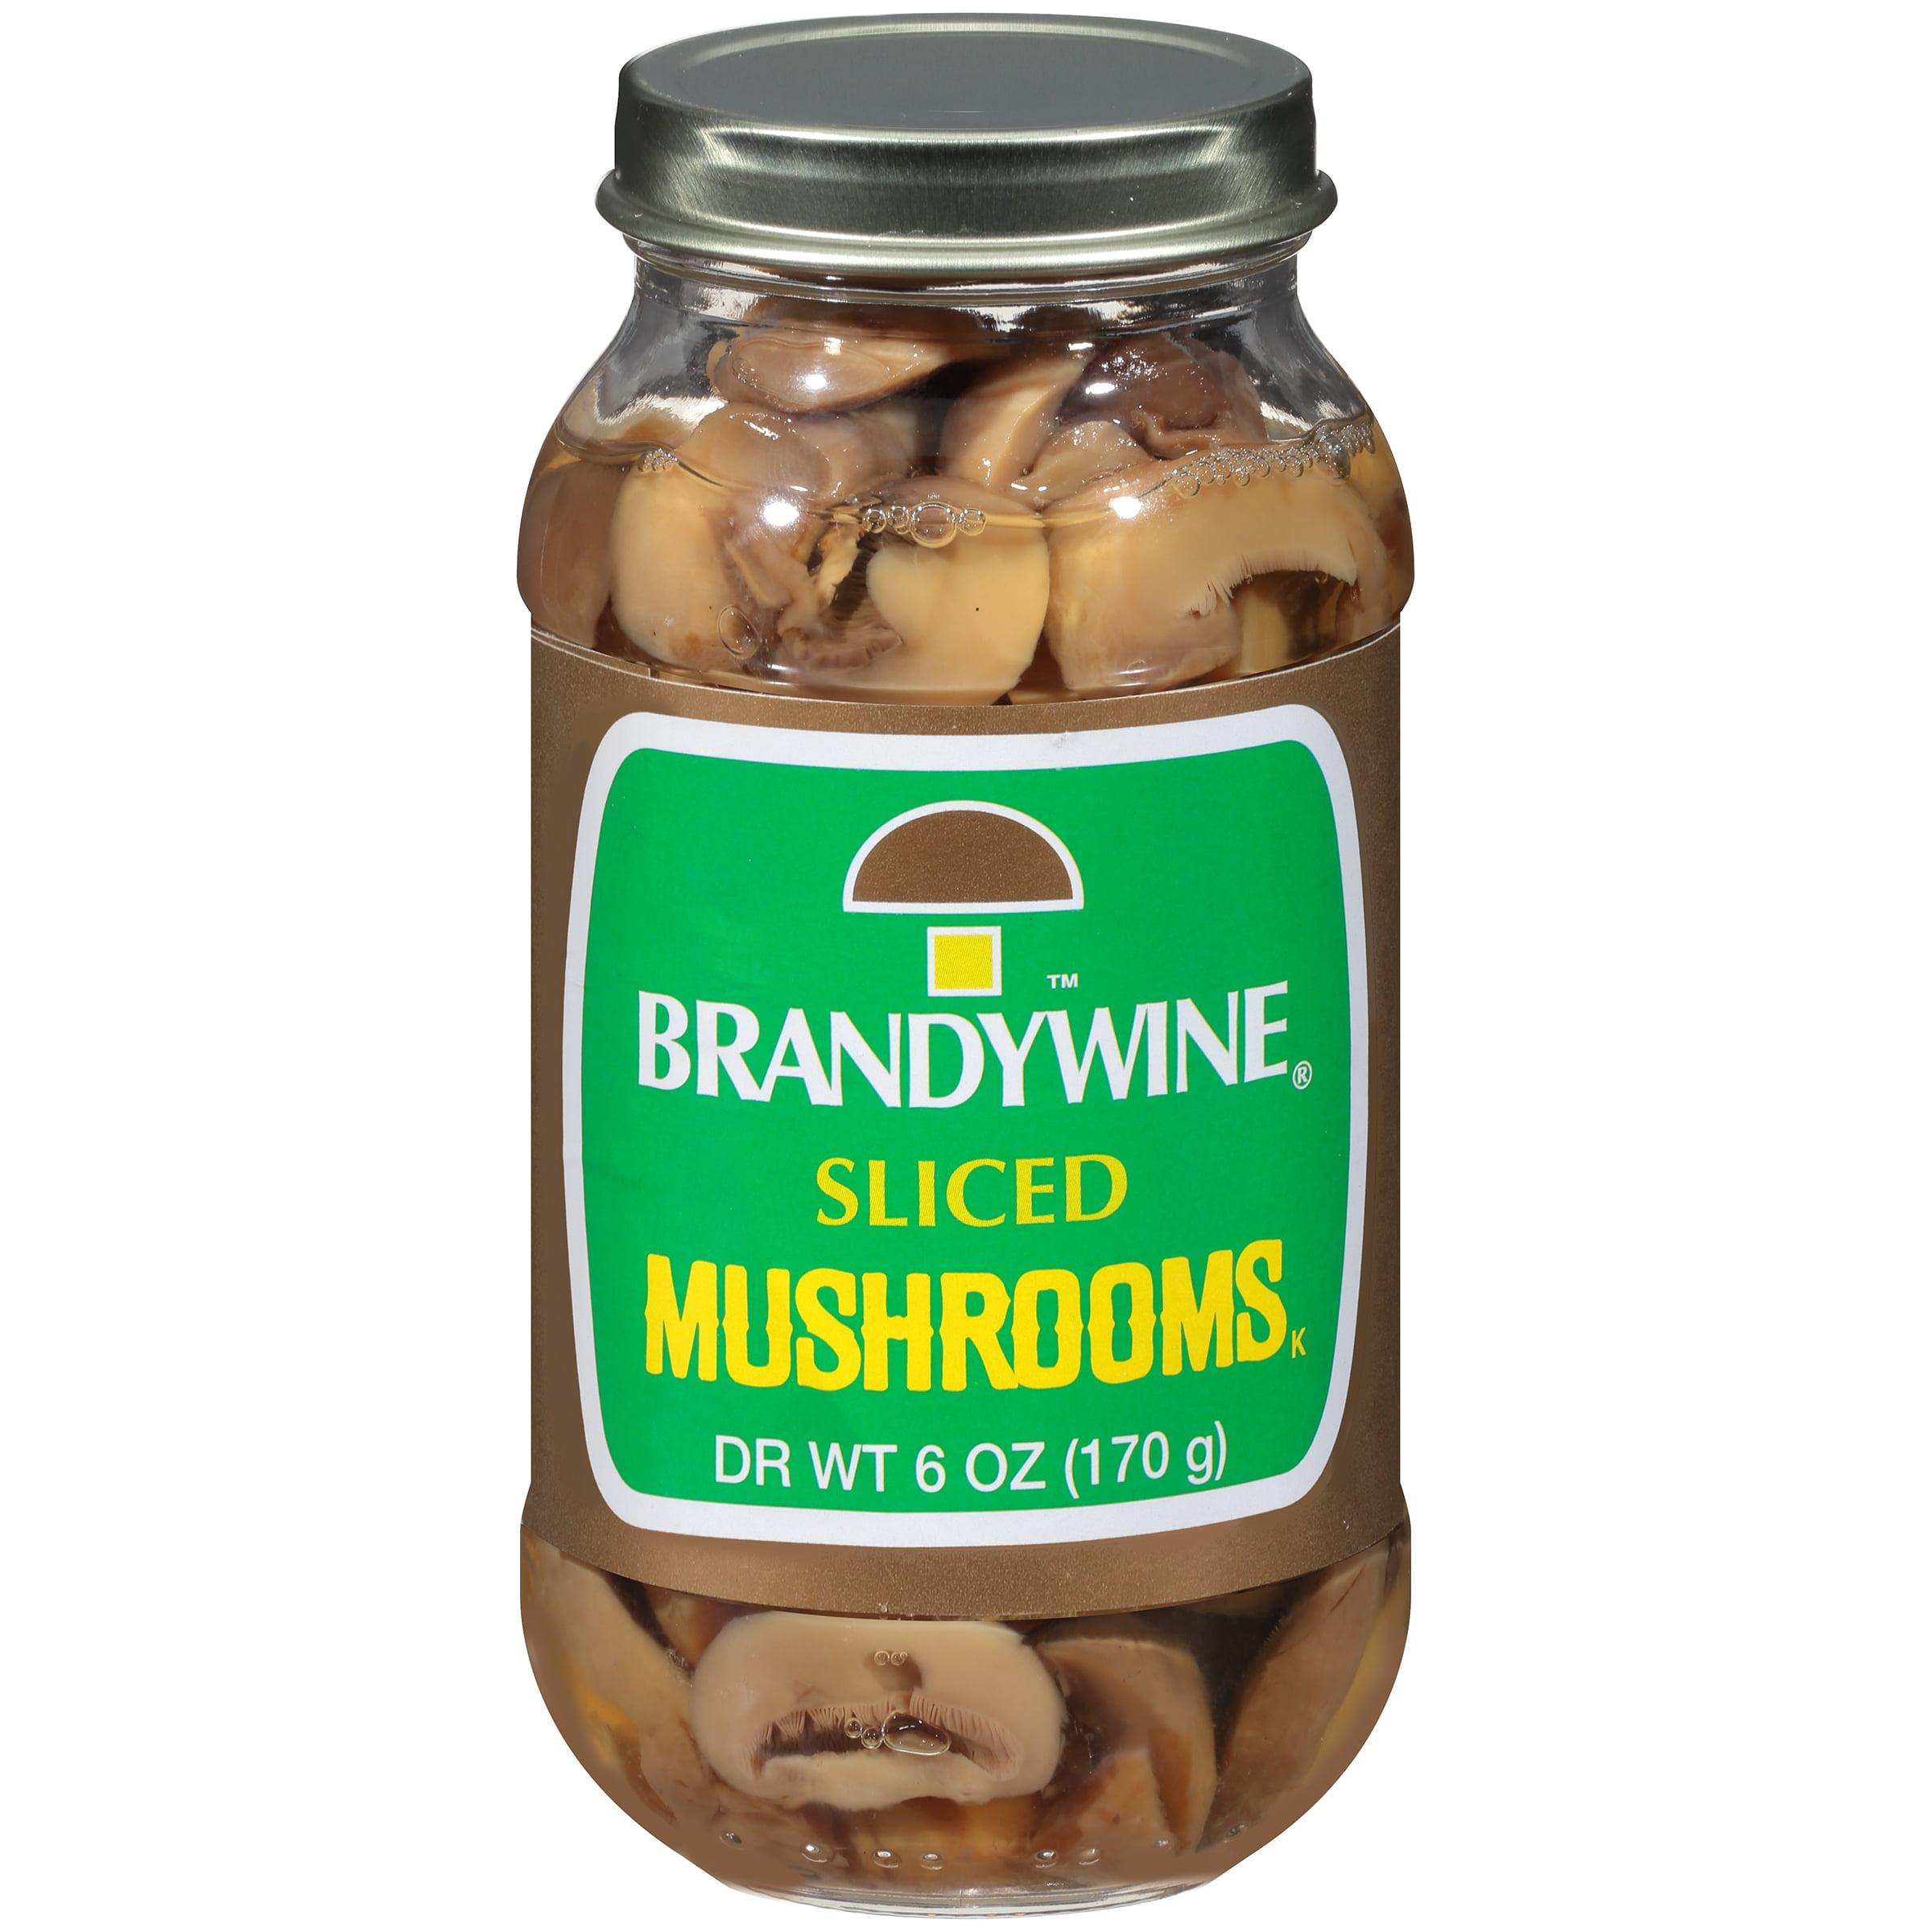 Brandywine Sliced Mushrooms 6 Oz Jar by Giorgio Foods, Inc.